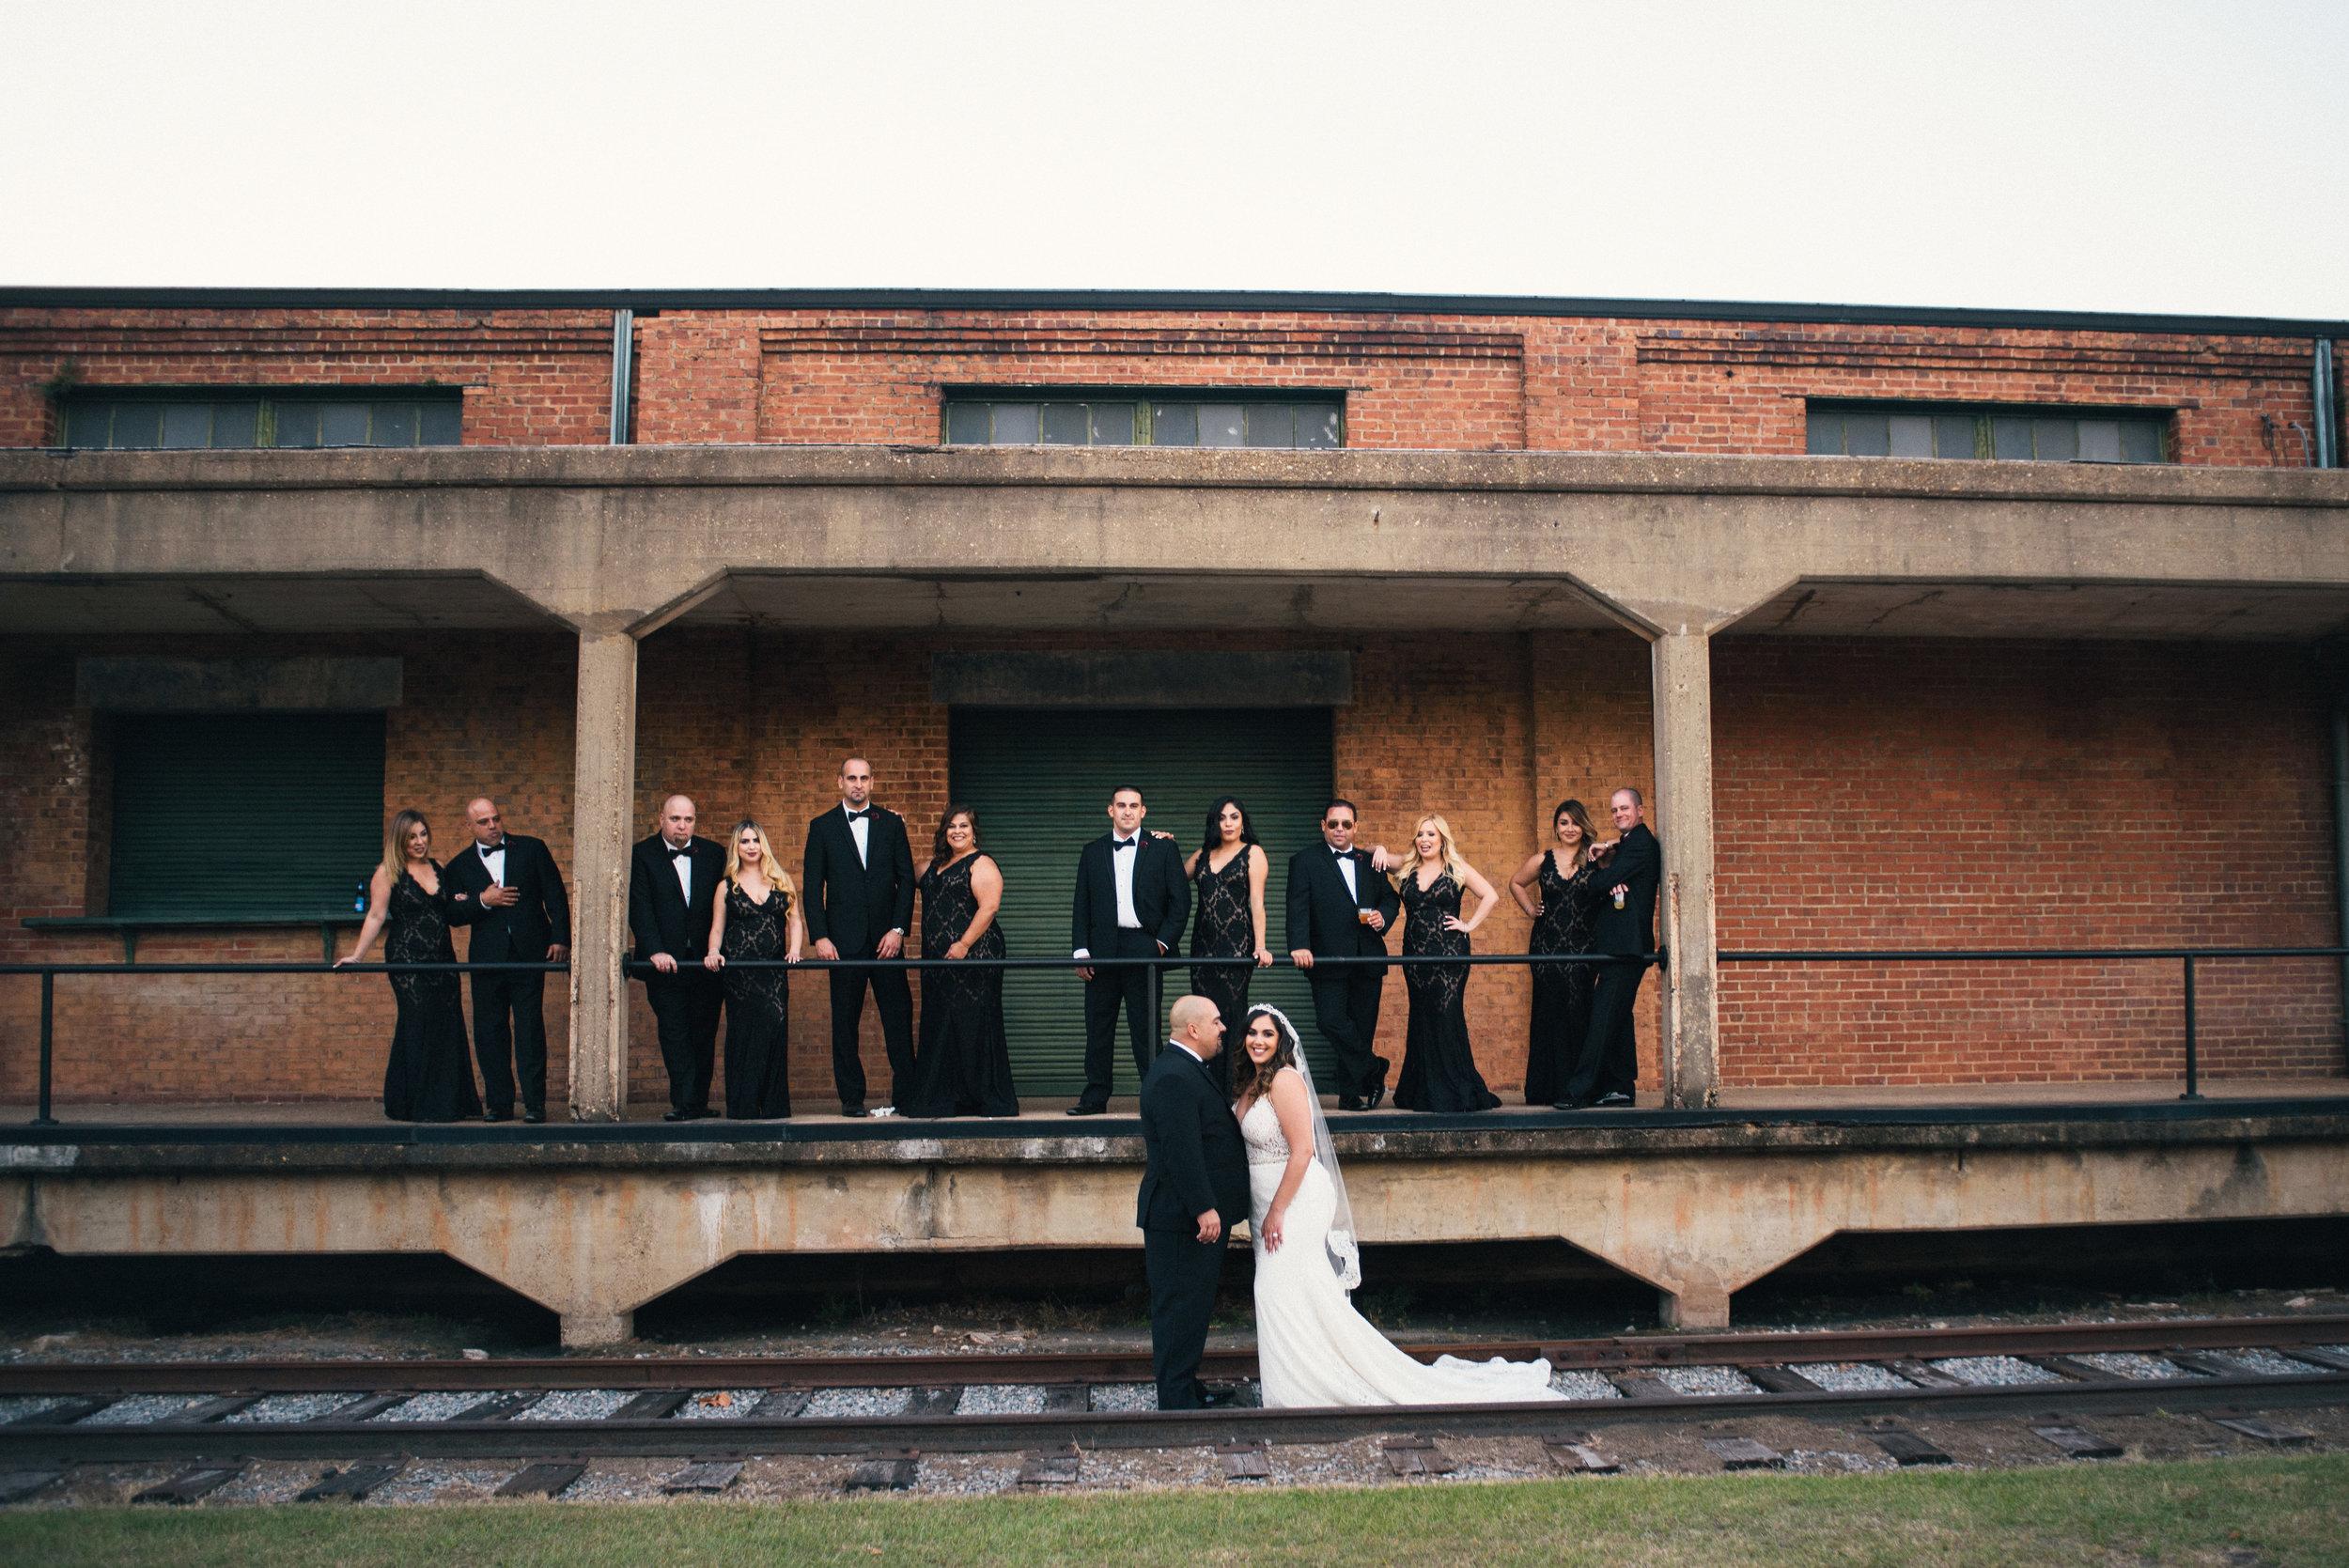 Iggy-and-yesenia-savannah-railroad-museum-wedding-meg-hill-photo- (736 of 1037).jpg